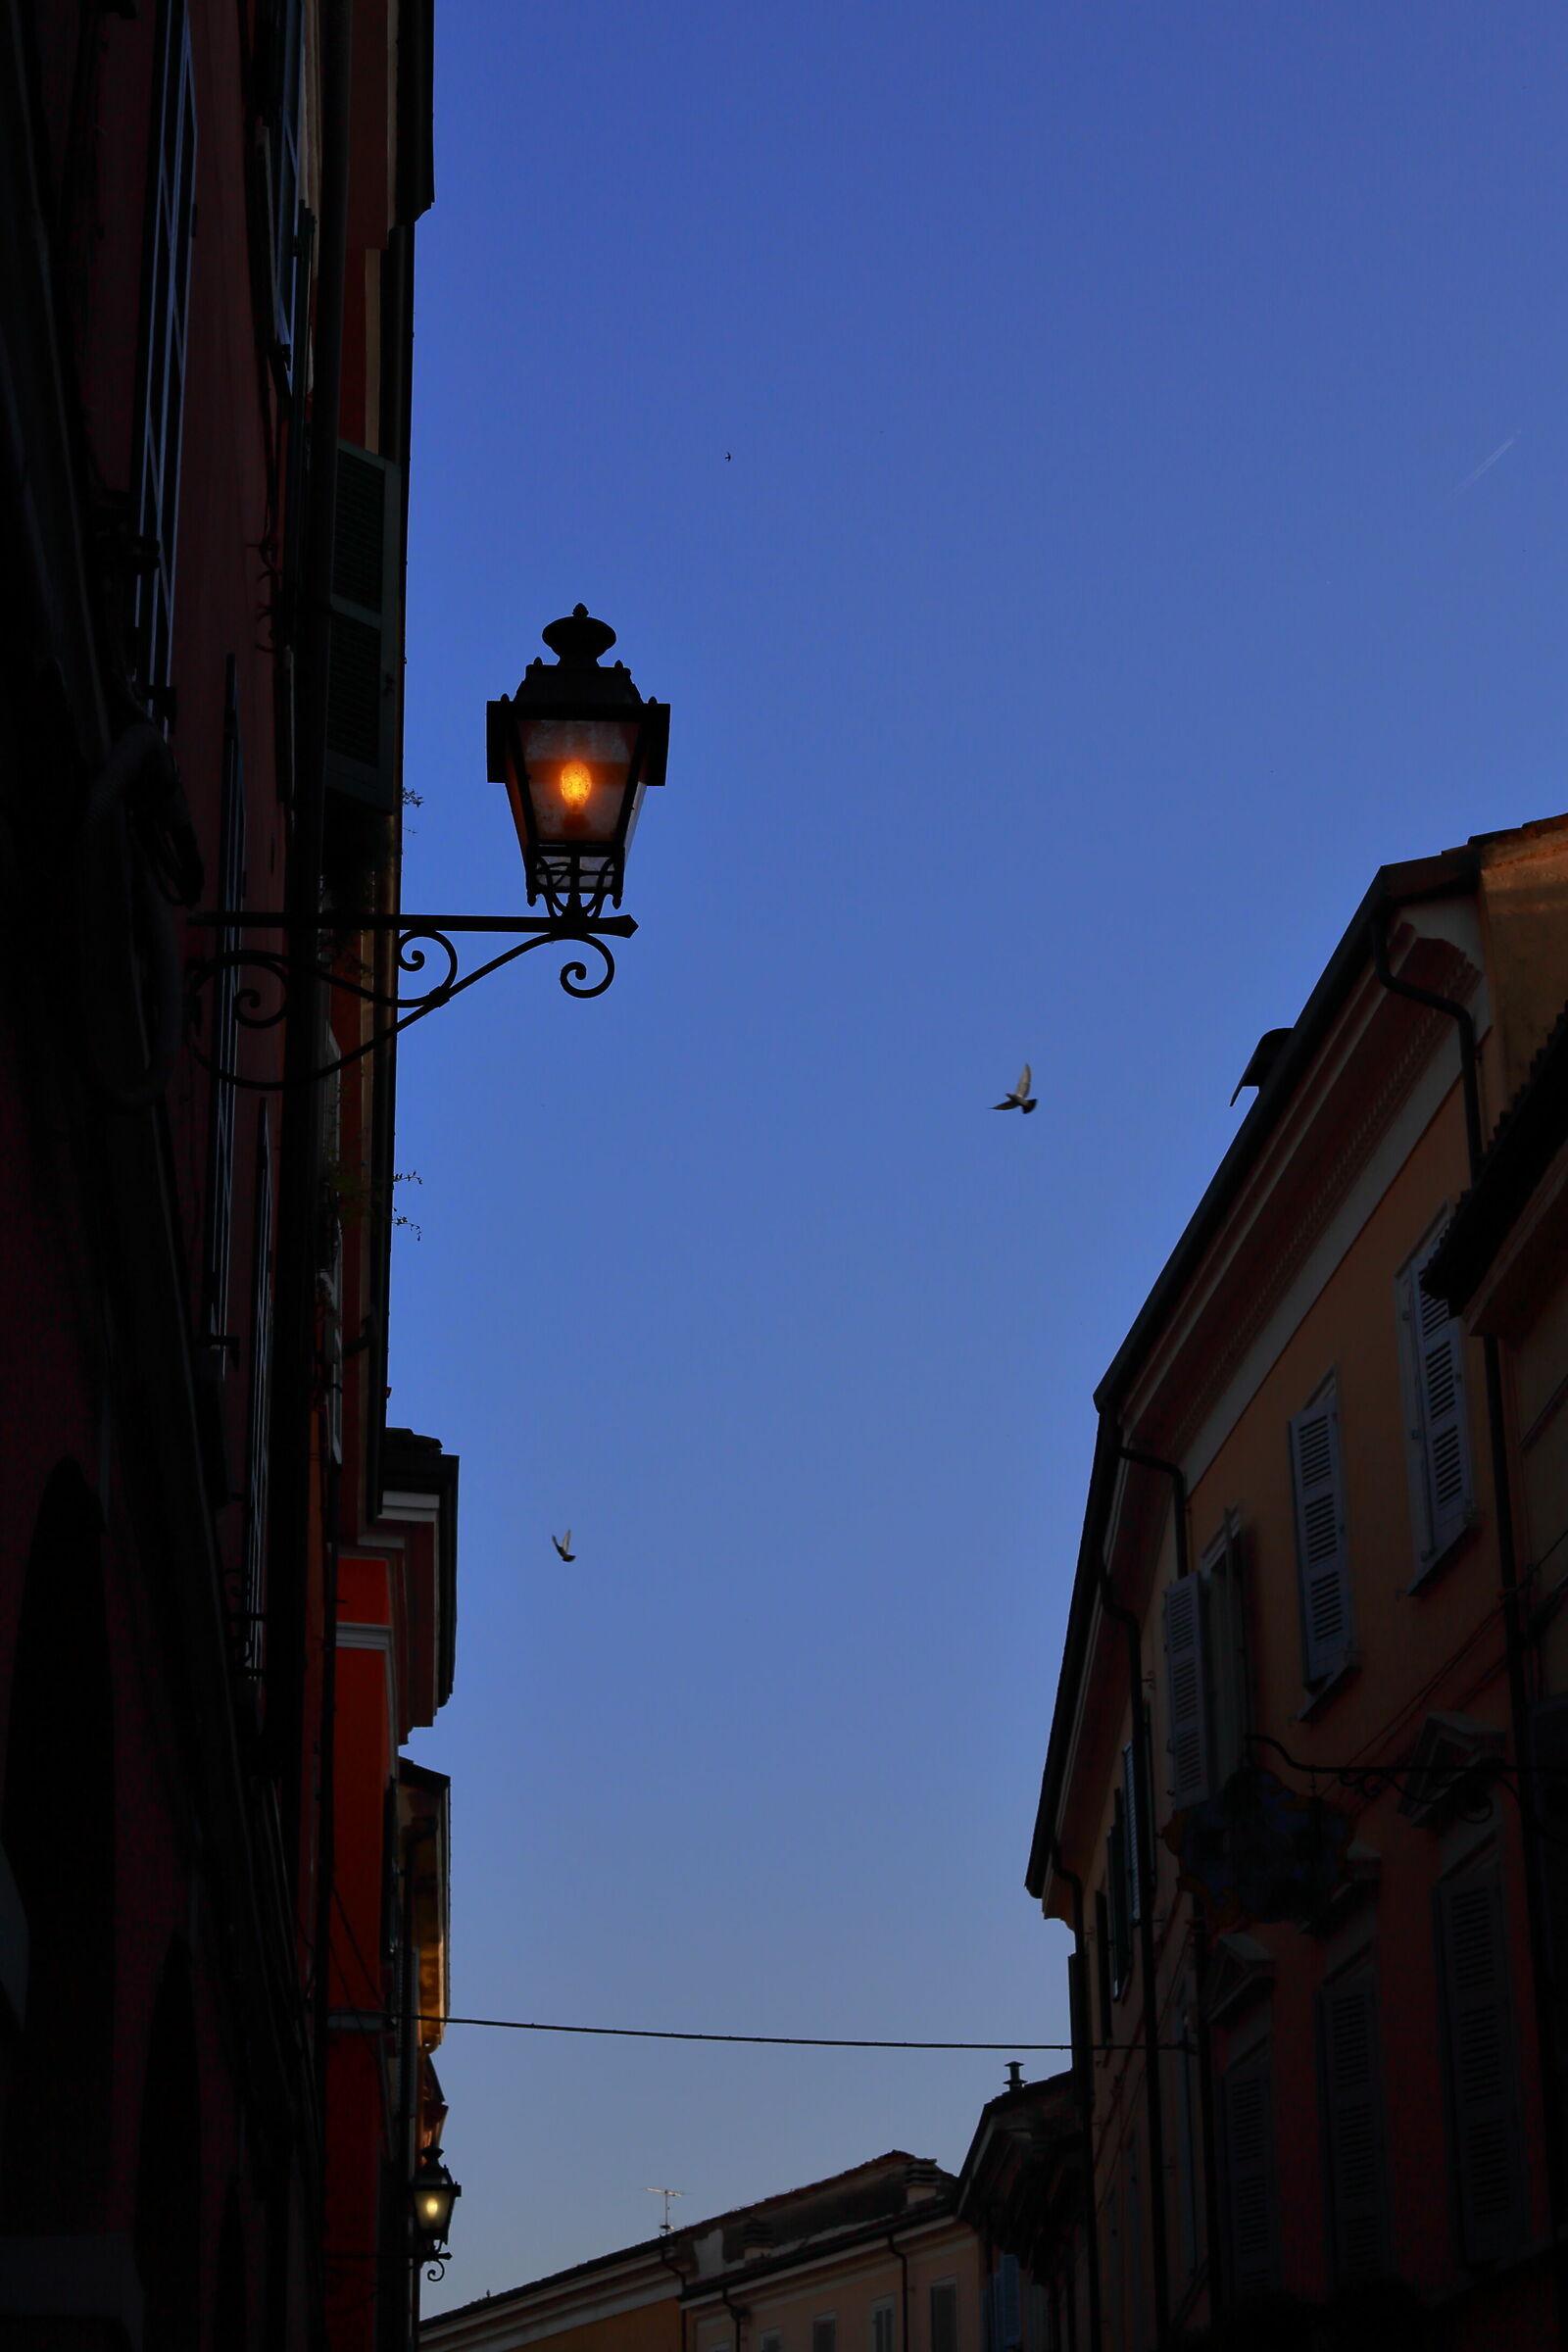 one evening in Guastalla...